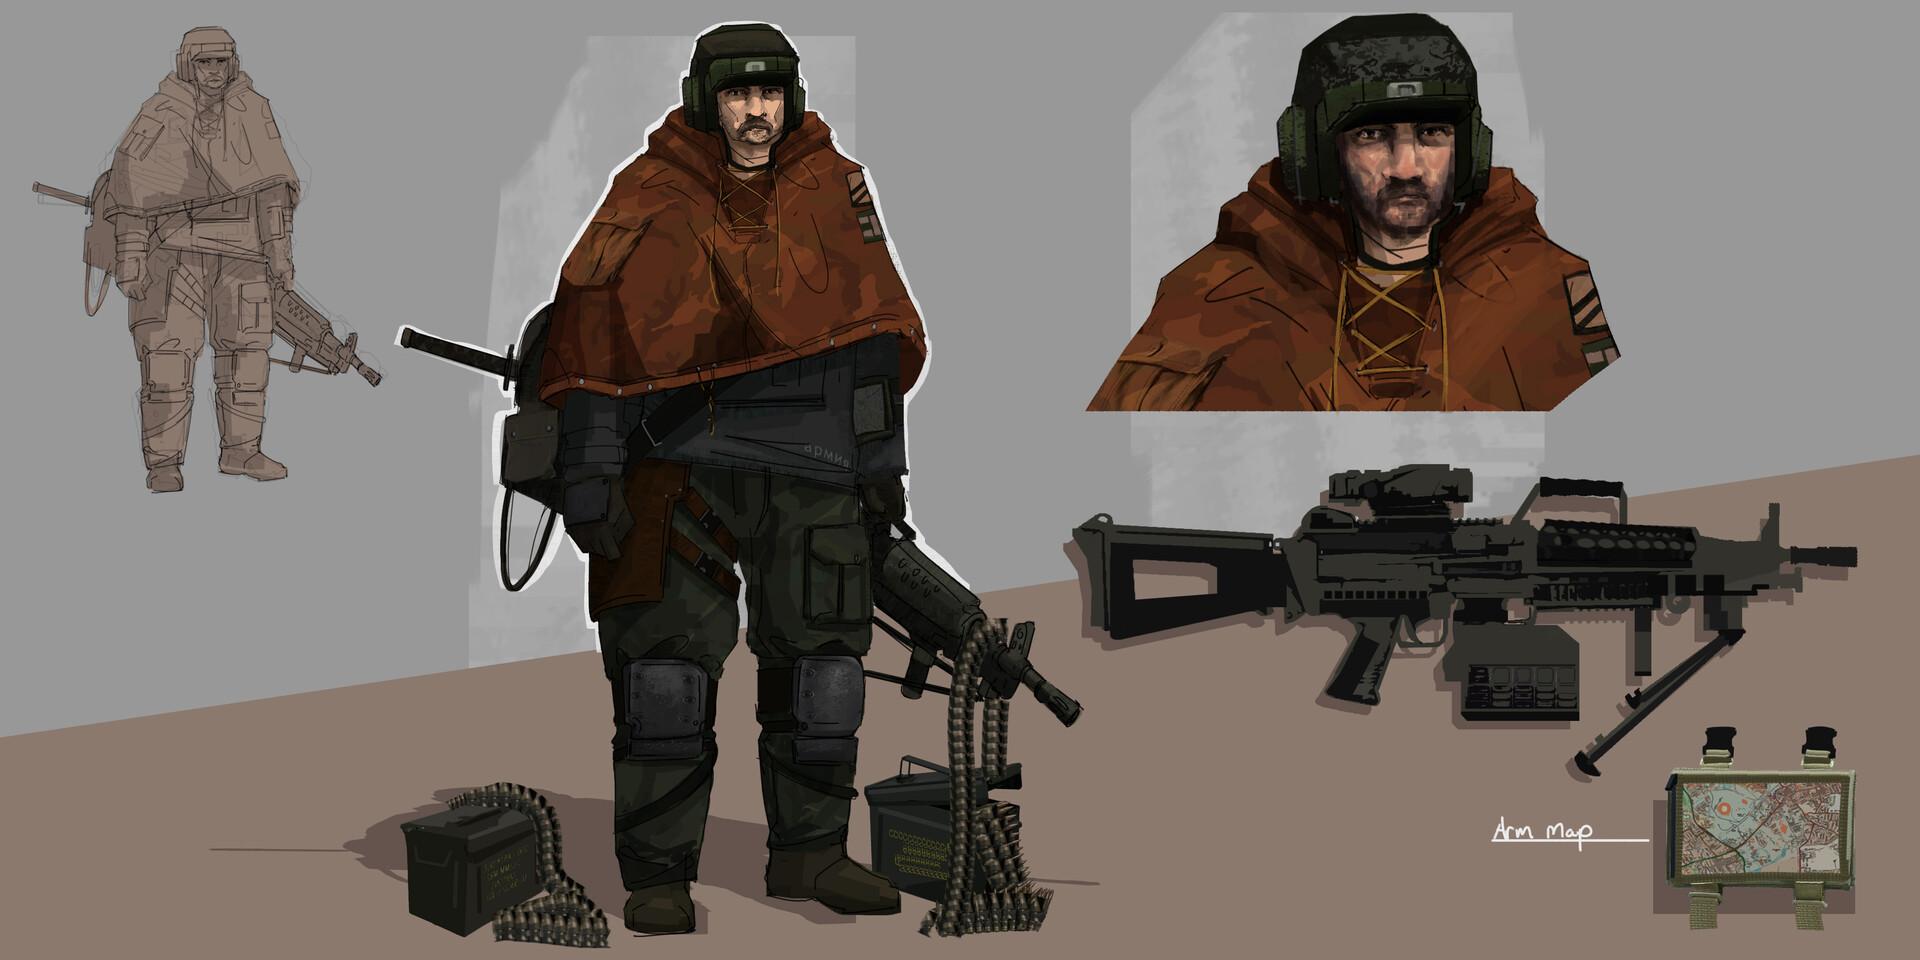 Jack dowell character development number 1 chosen character